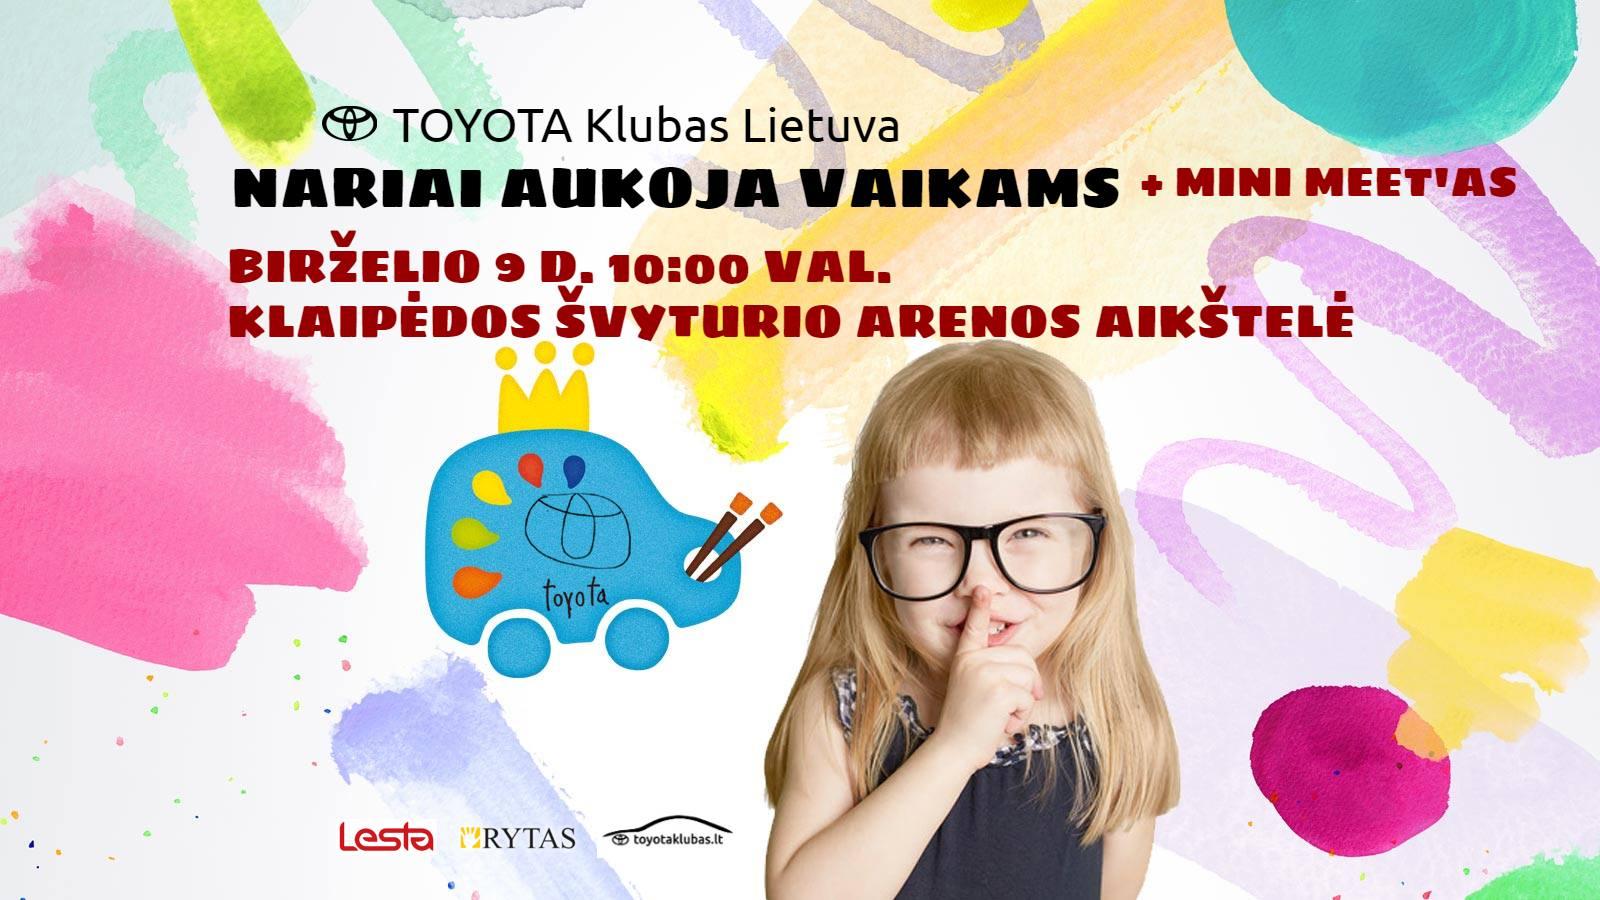 Aukok vaikams - TOYOTA Klubas Lietuva akcija